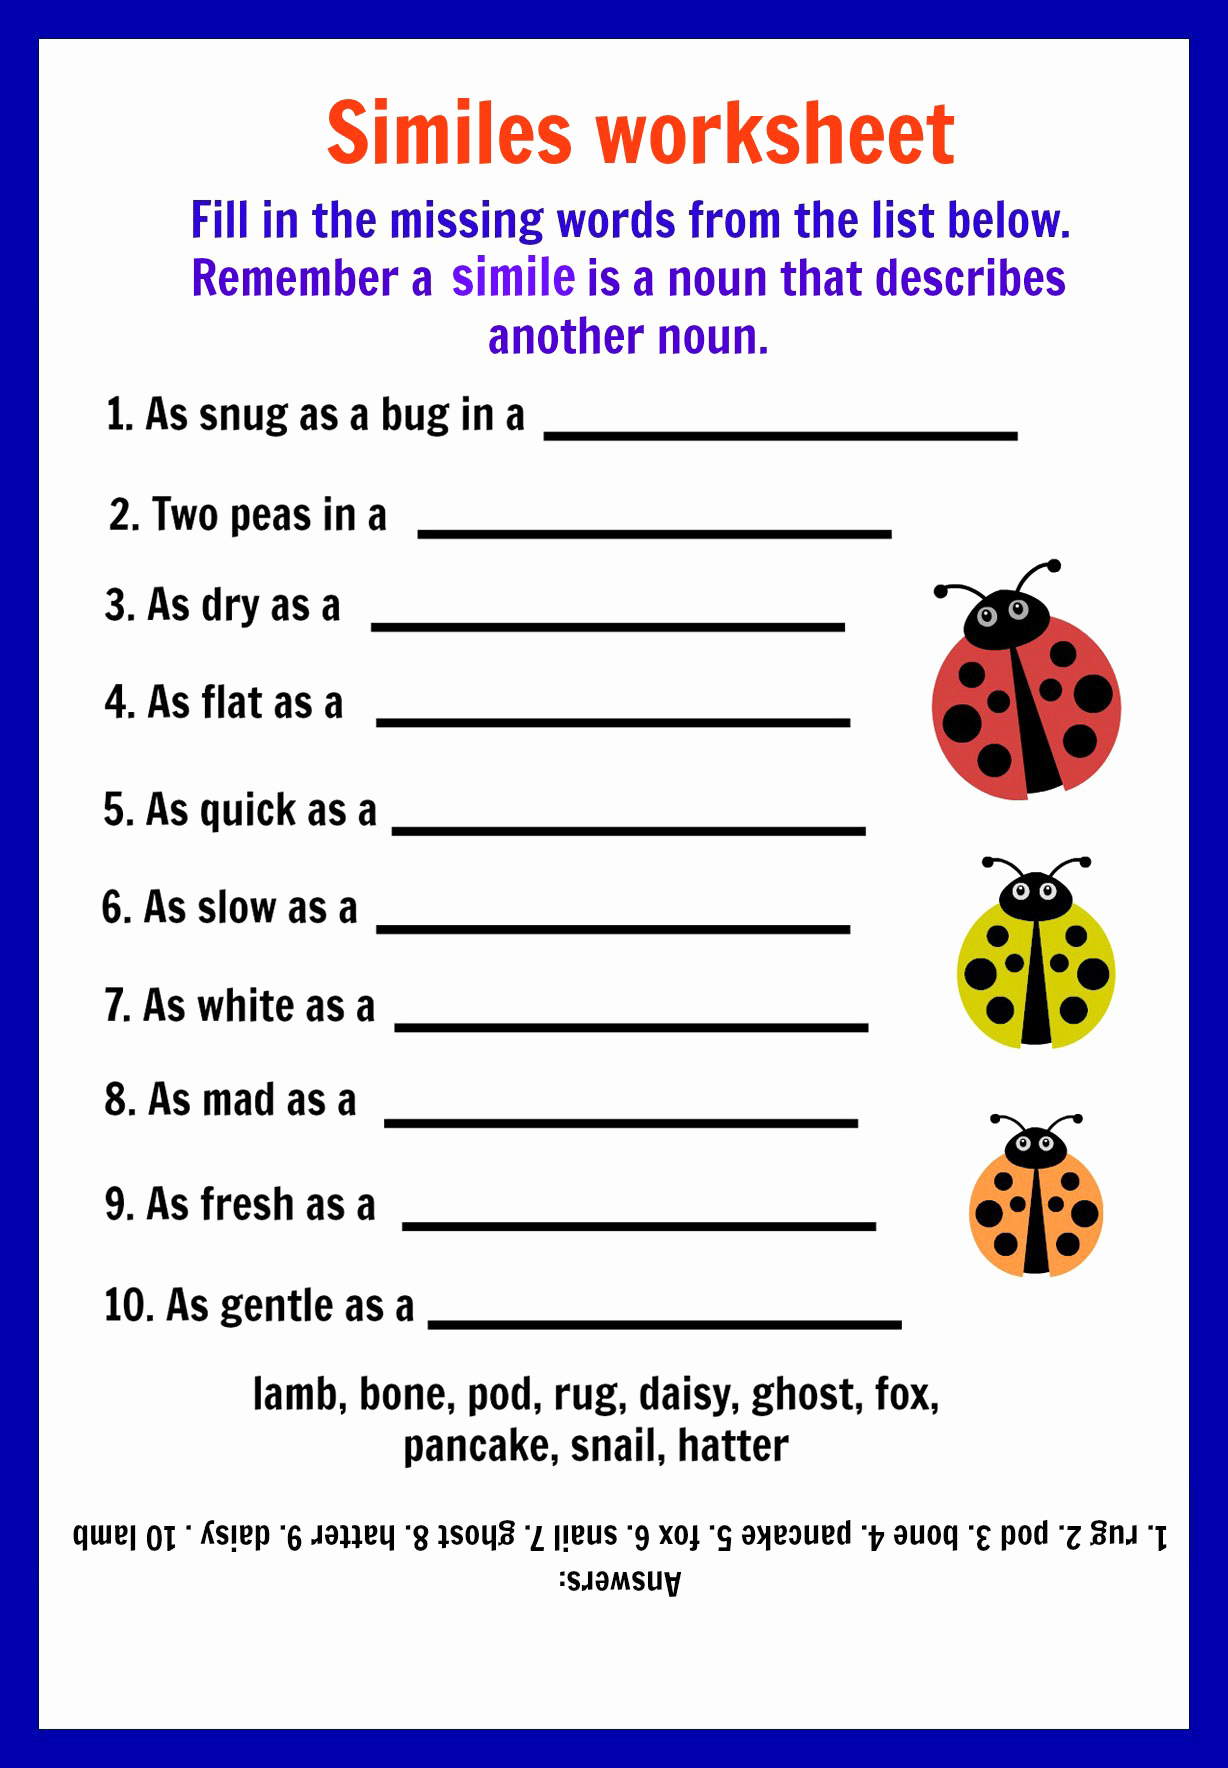 Free Printable Simile Worksheets Beautiful Similes Worksheets for Kids